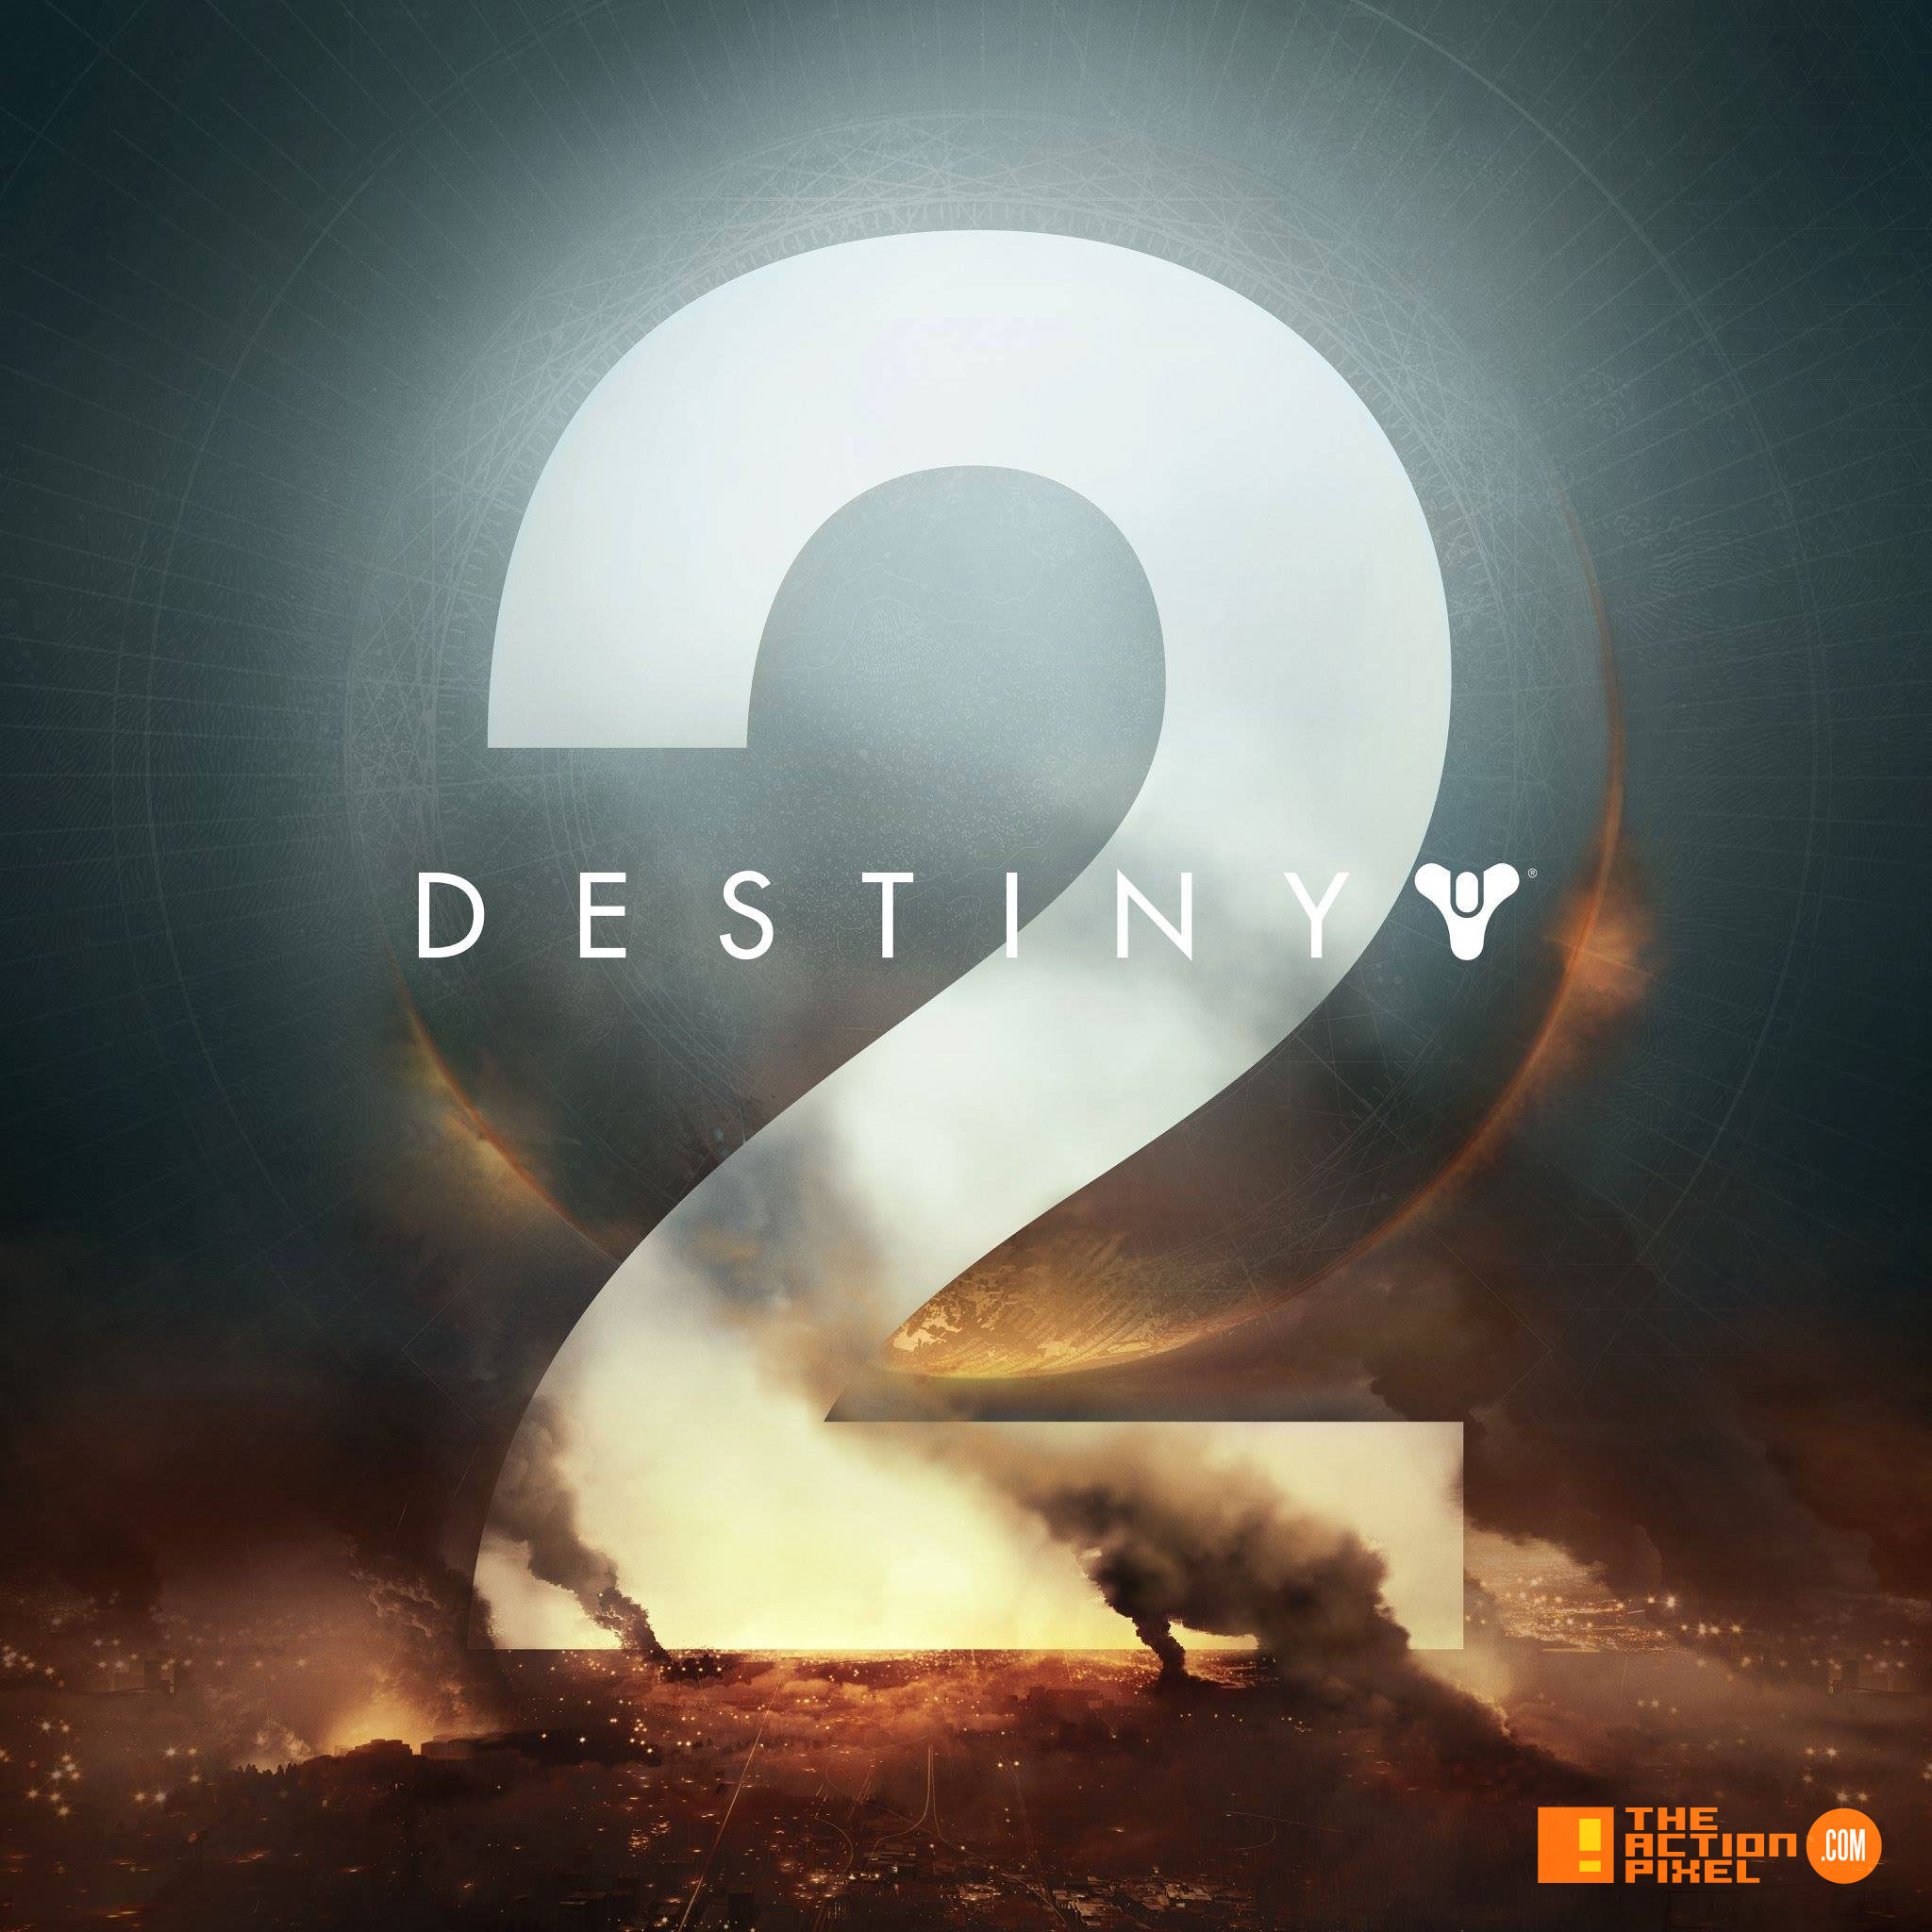 """Destiny 2"" key art and logo revealed - The Action Pixel"